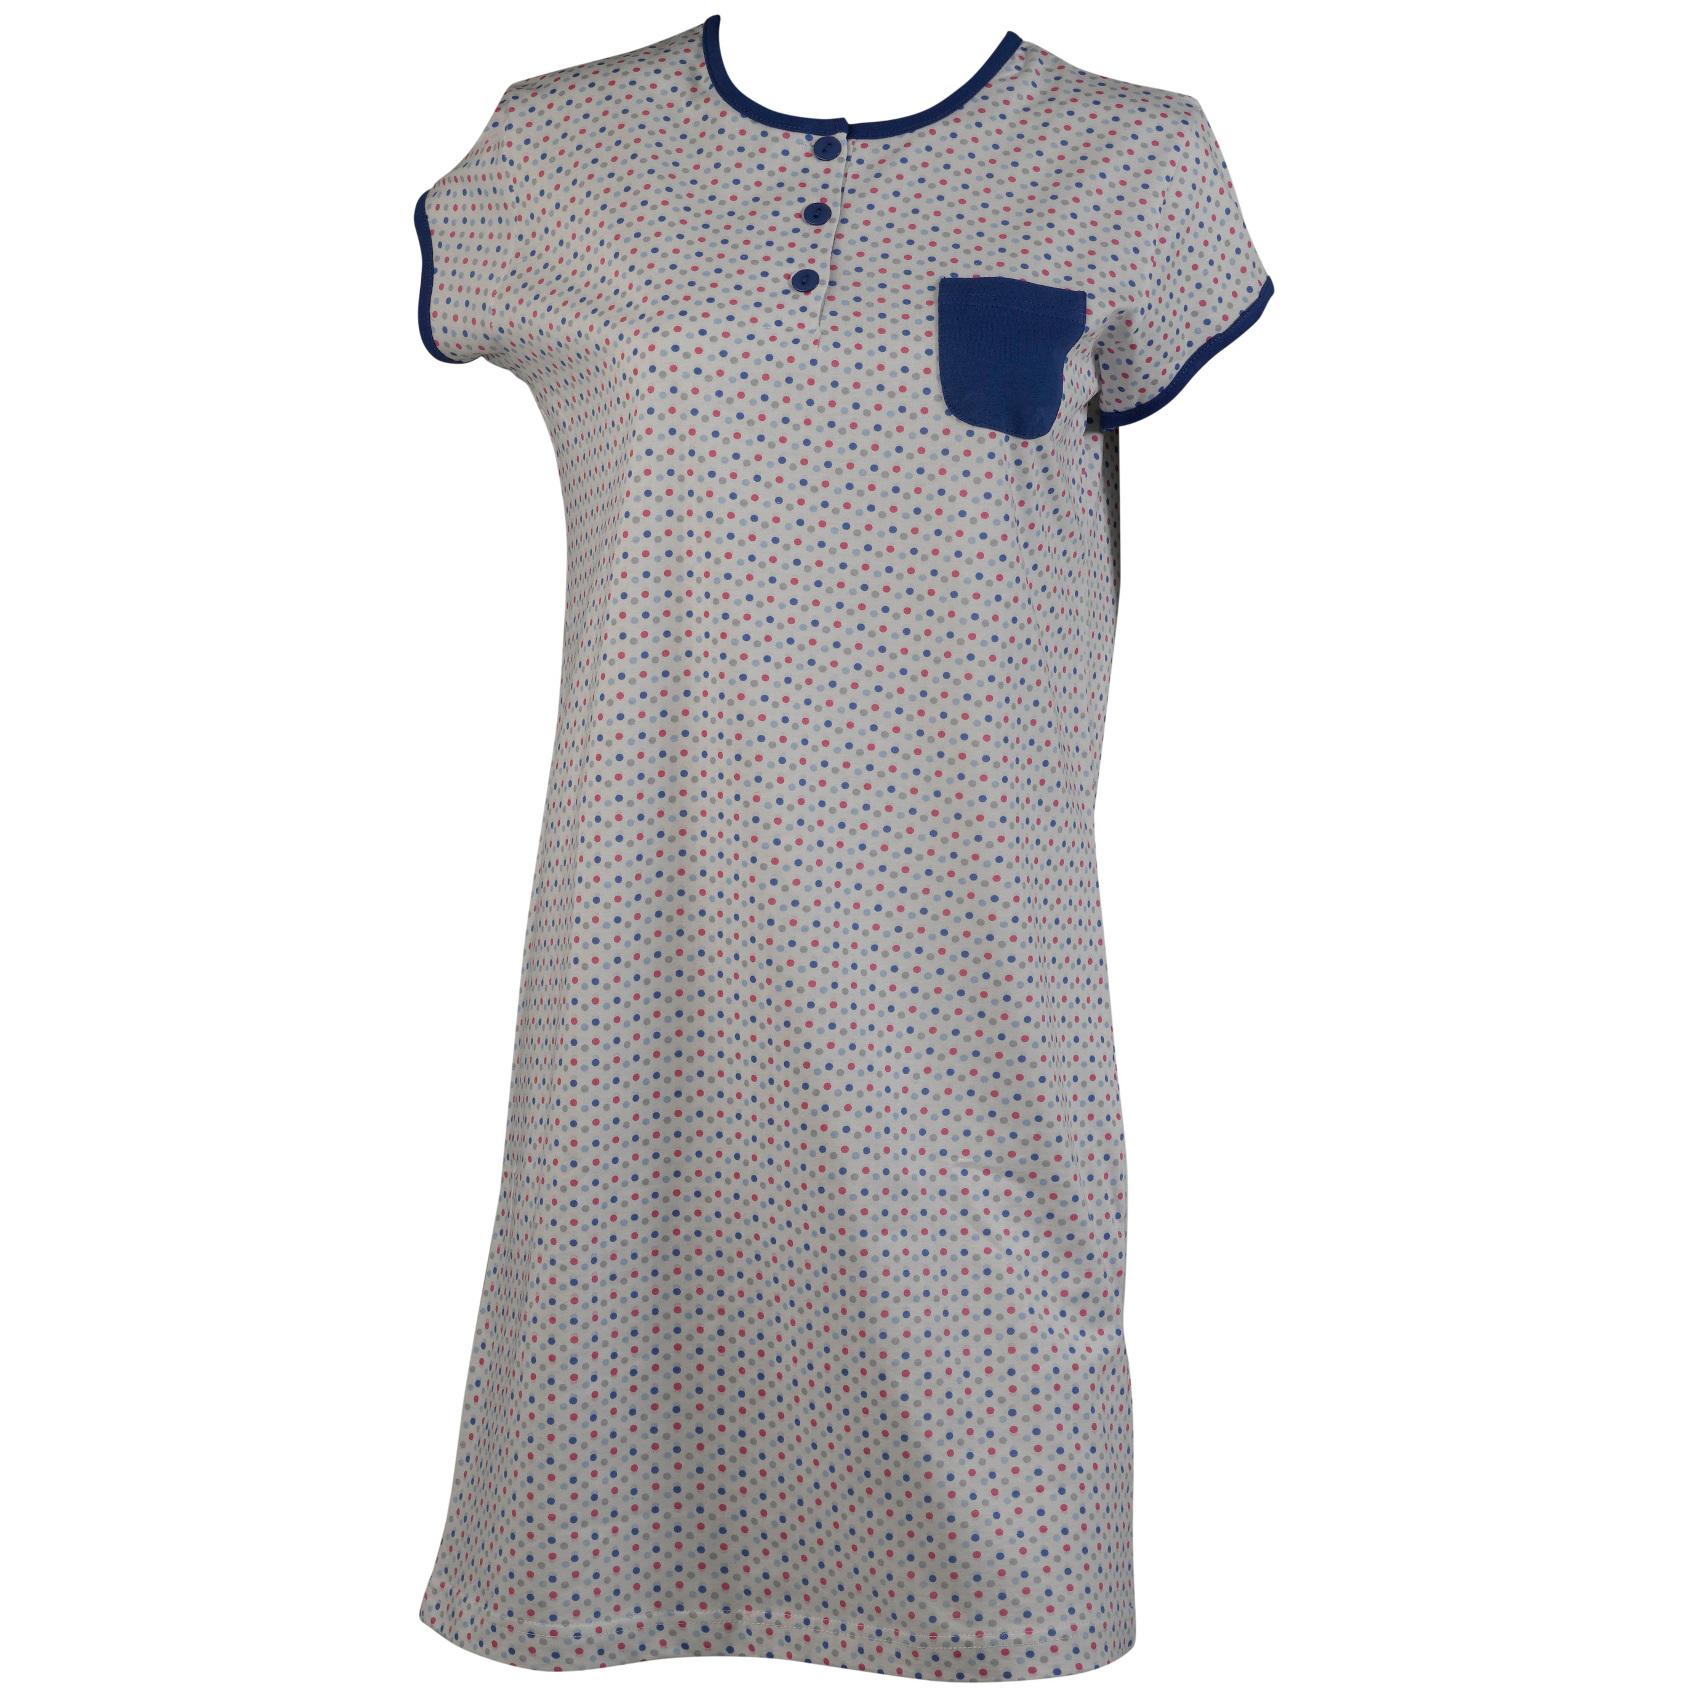 Black t shirt nightdress - Womens Cotton Polka Dot Nighty Ladies Short Sleeve